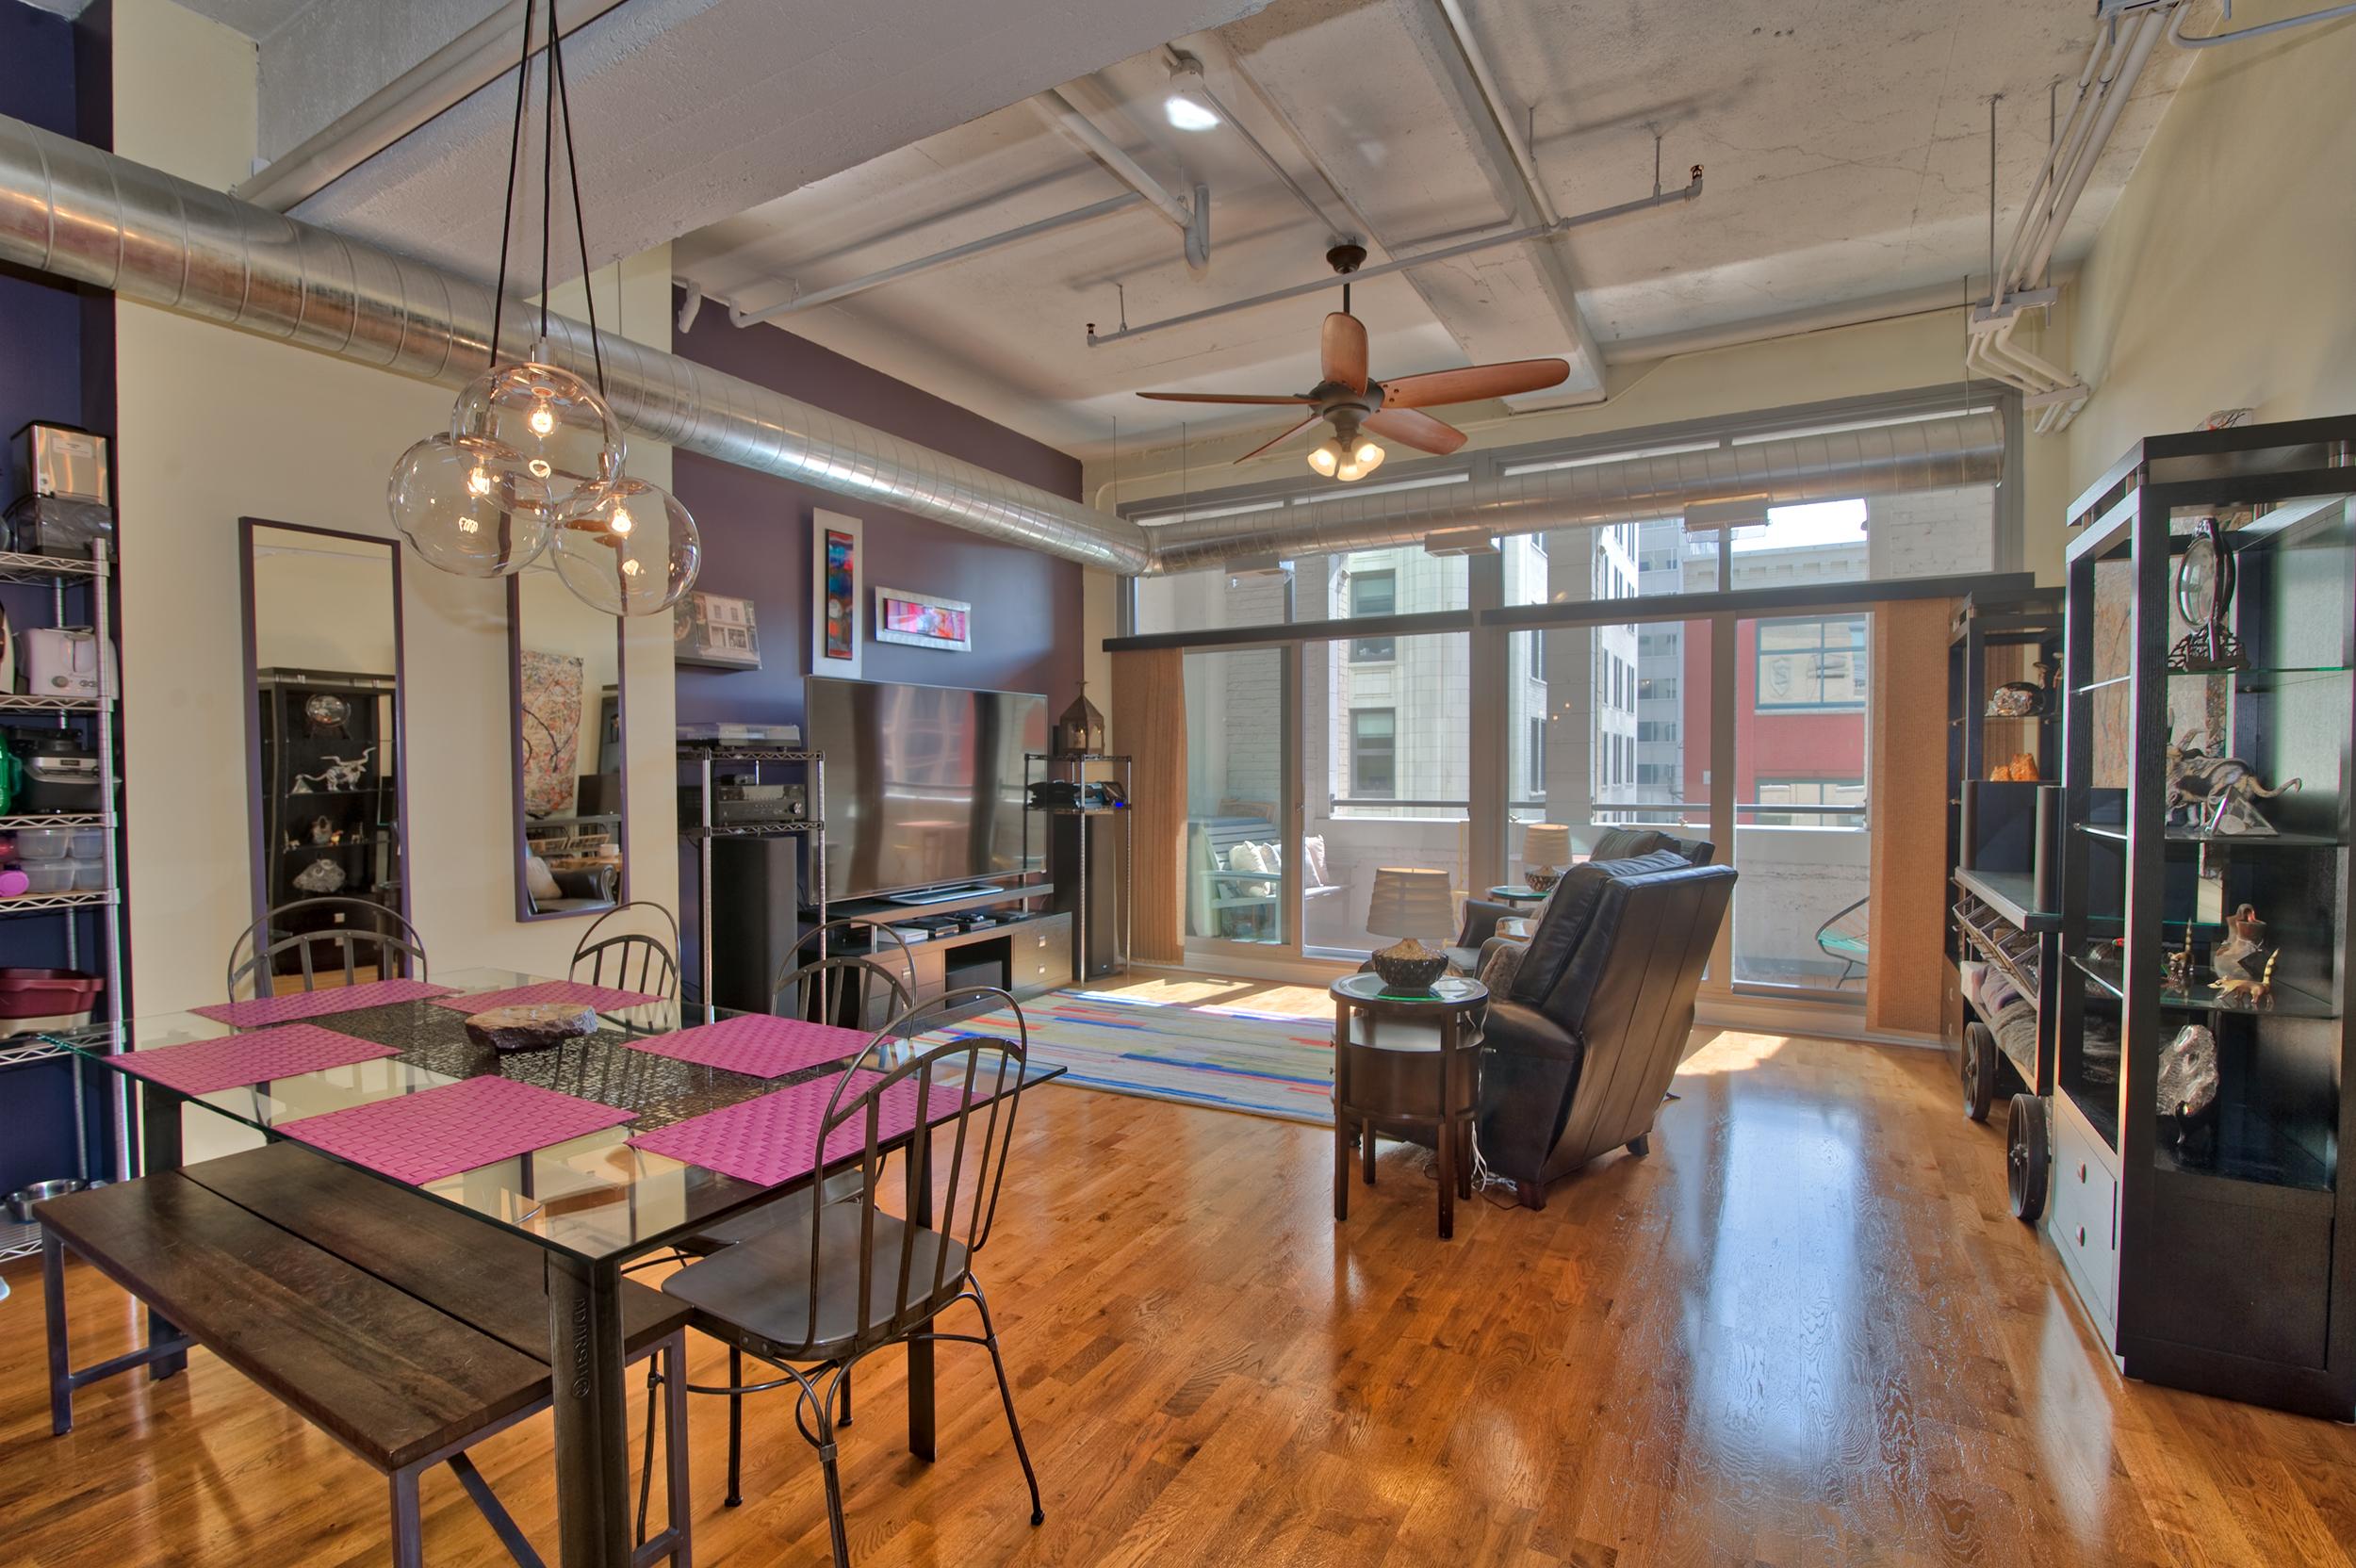 Modern lofted living space